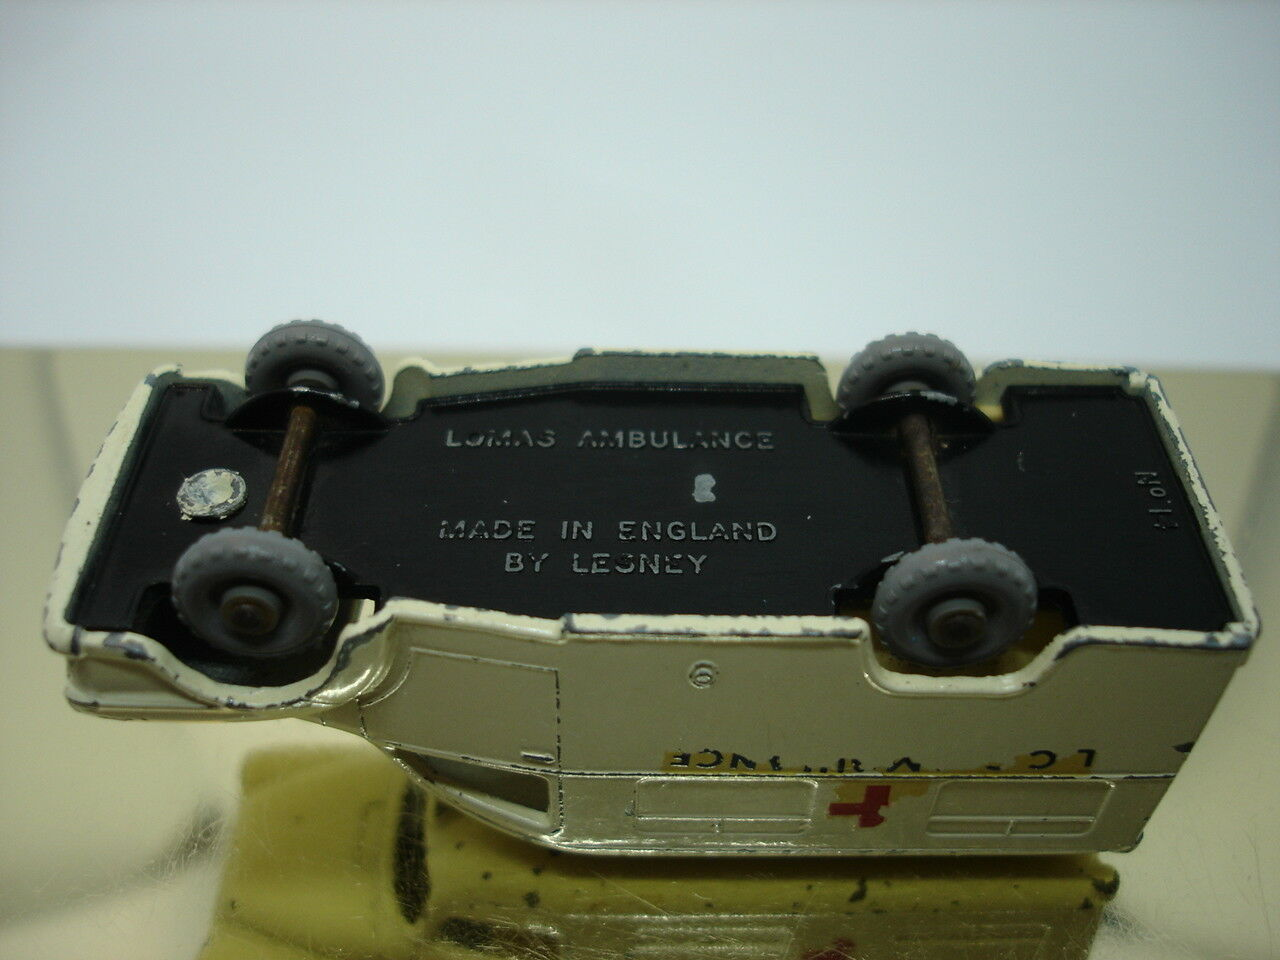 basta comprarlo MATCHscatola 1-75 1-75 1-75 Moko Lesney n. 14 C Lomas Ambulance 1962 67mm grigioepr  presa di fabbrica